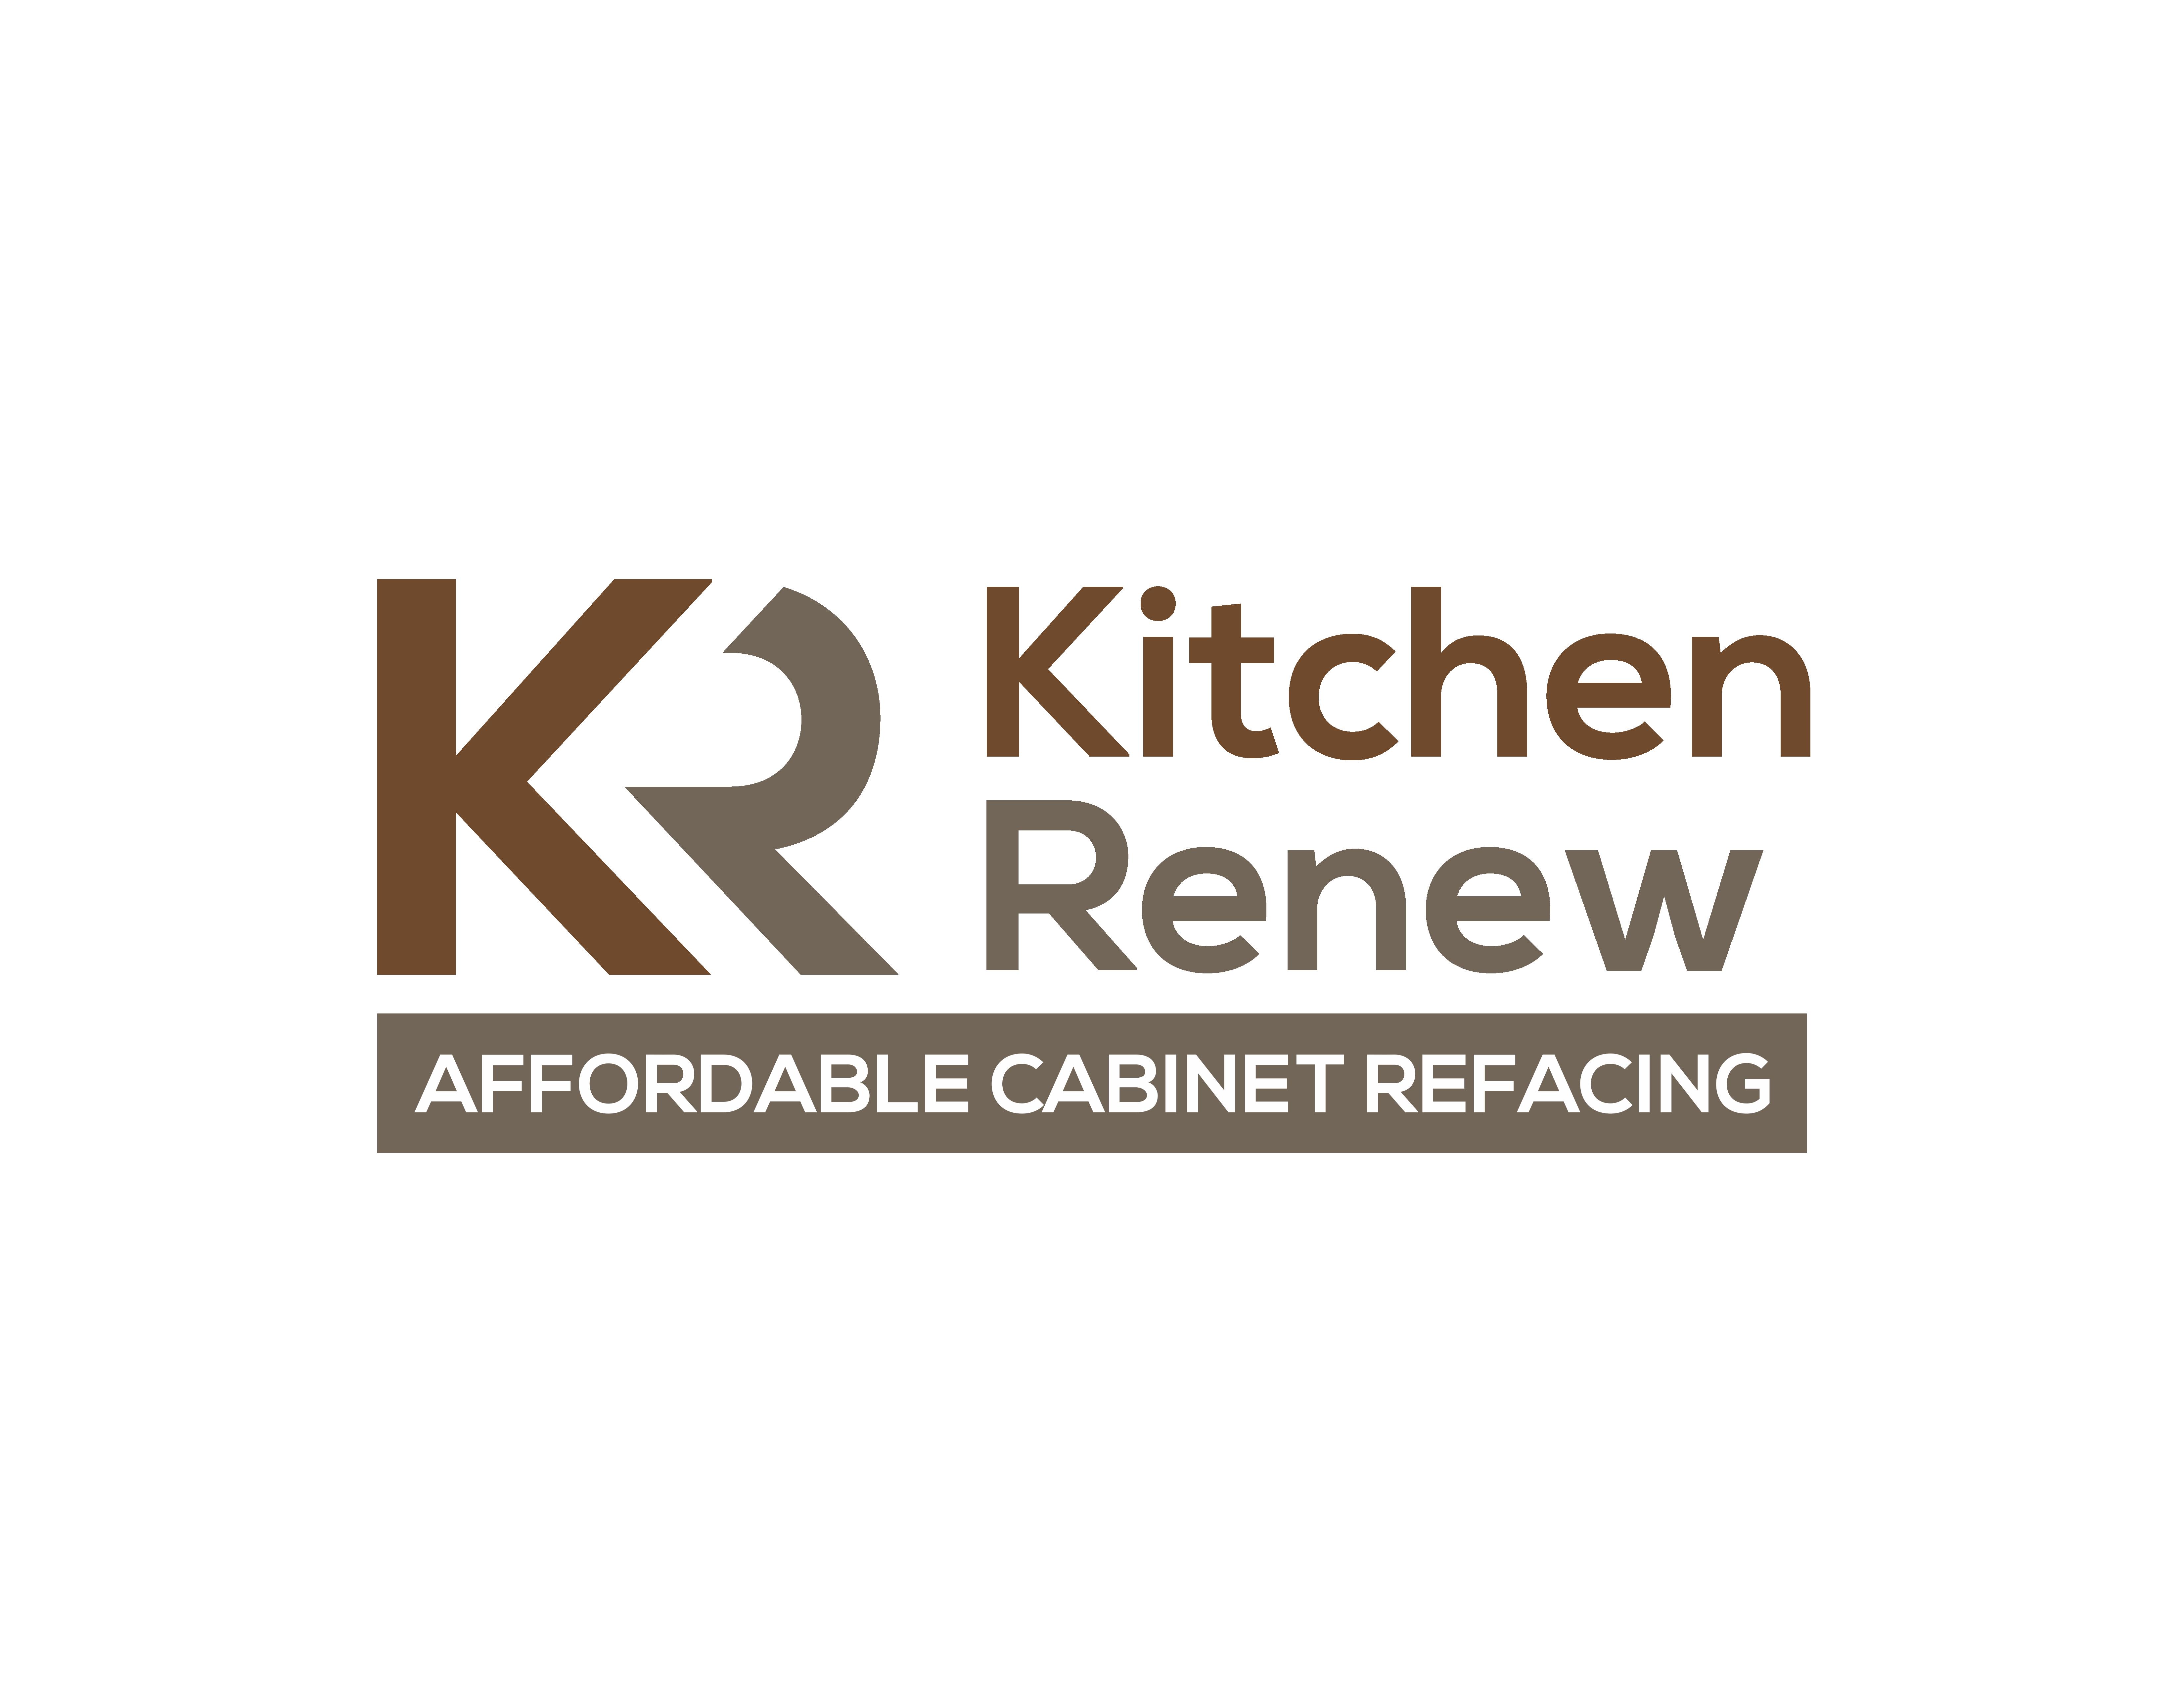 Kitchen Renew Cabinet Refacing Serving Central Florida   407 366 3829